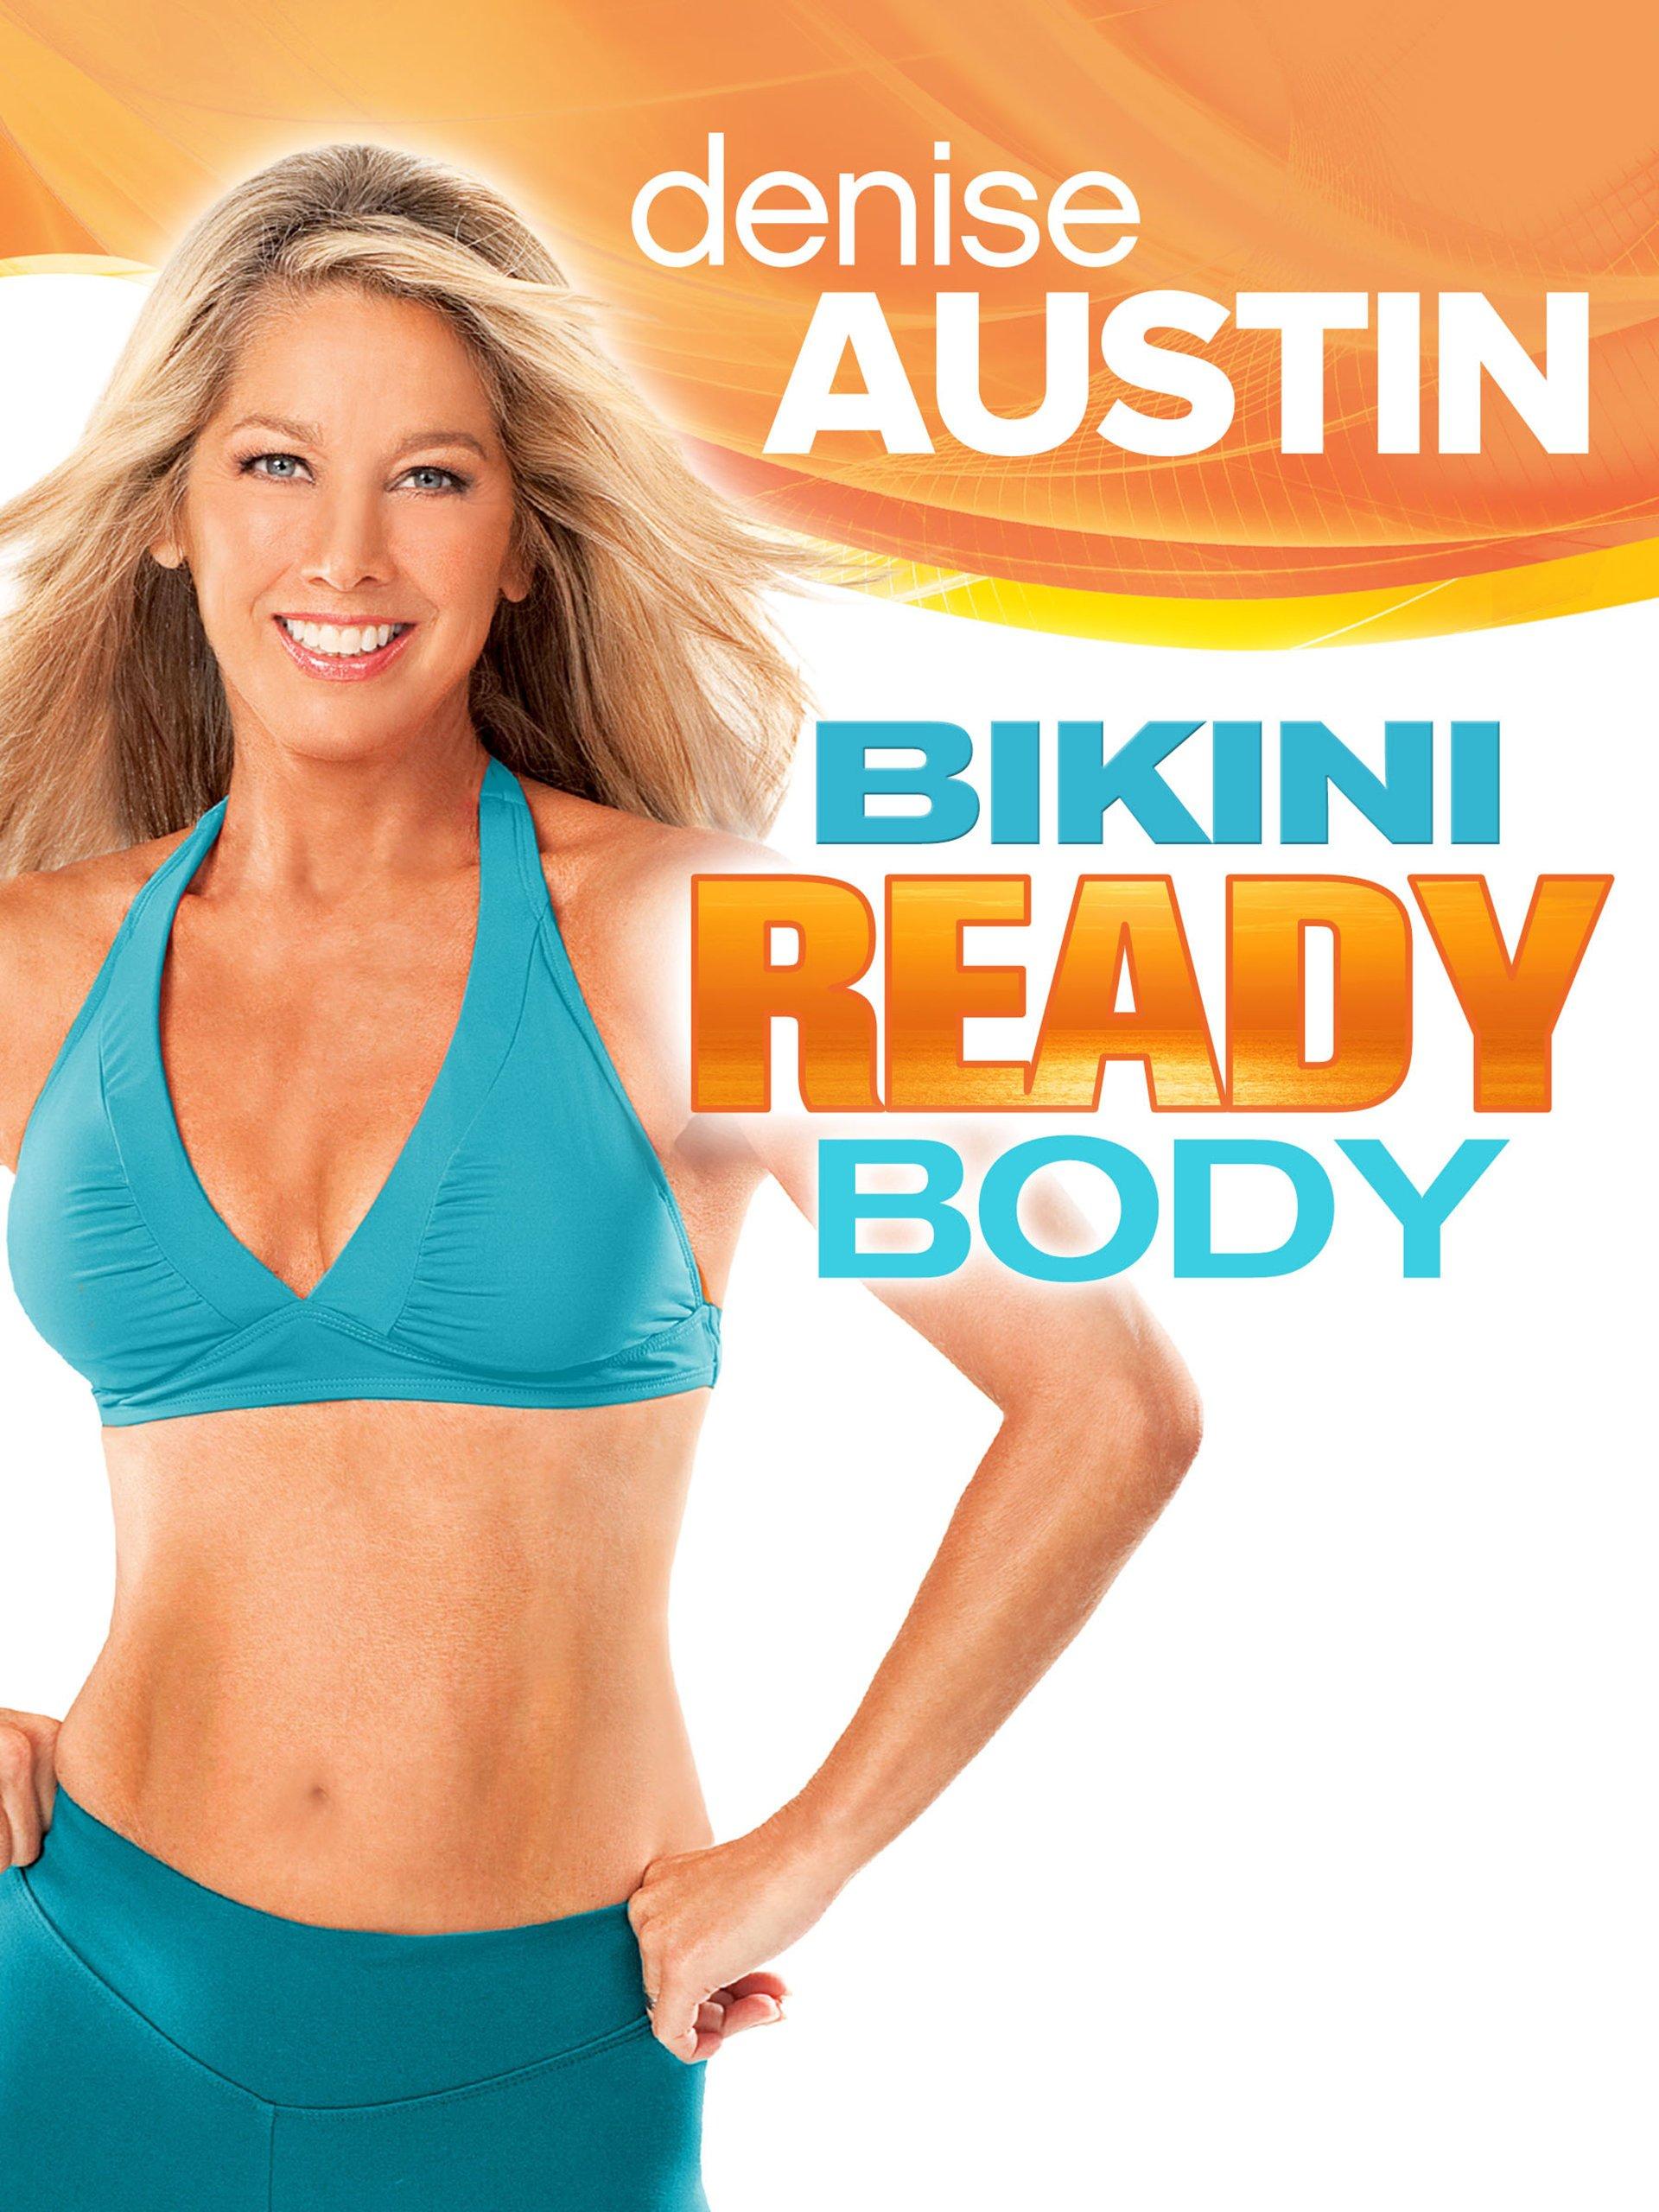 austin-bikini-denise-verry-young-girl-xxx